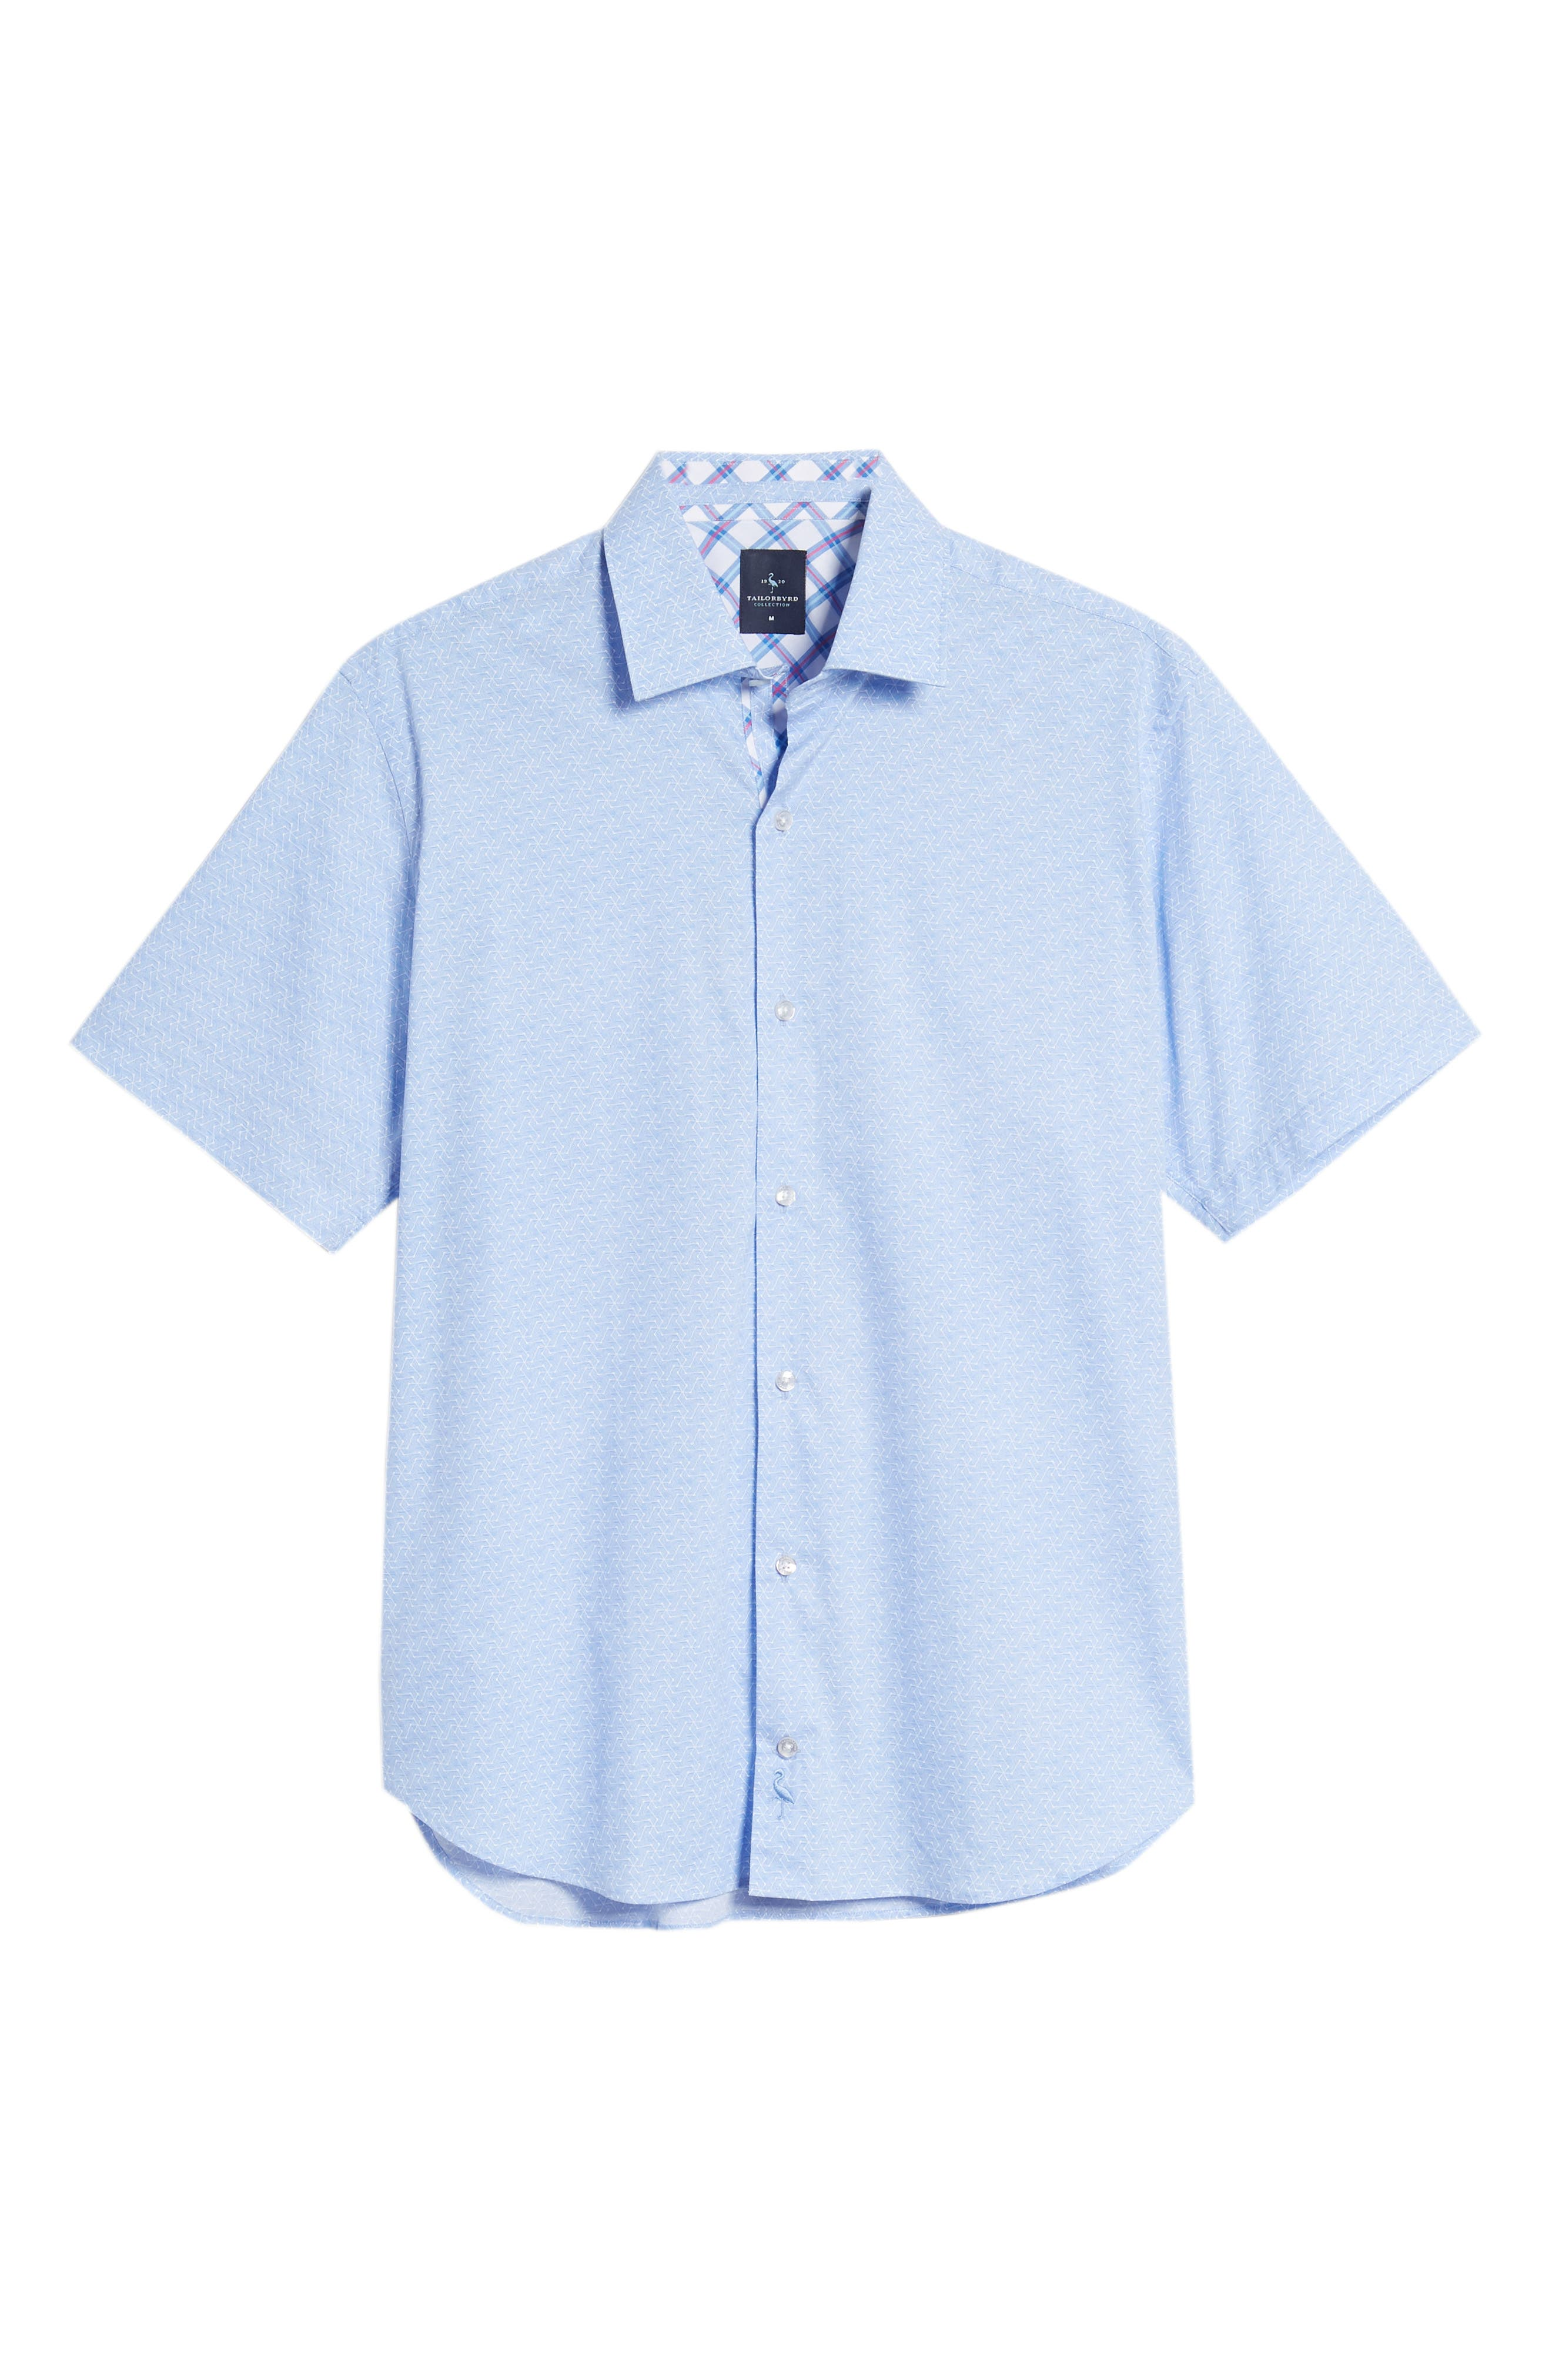 Acton Regular Fit Geo Print Sport Shirt,                             Alternate thumbnail 6, color,                             Light Blue